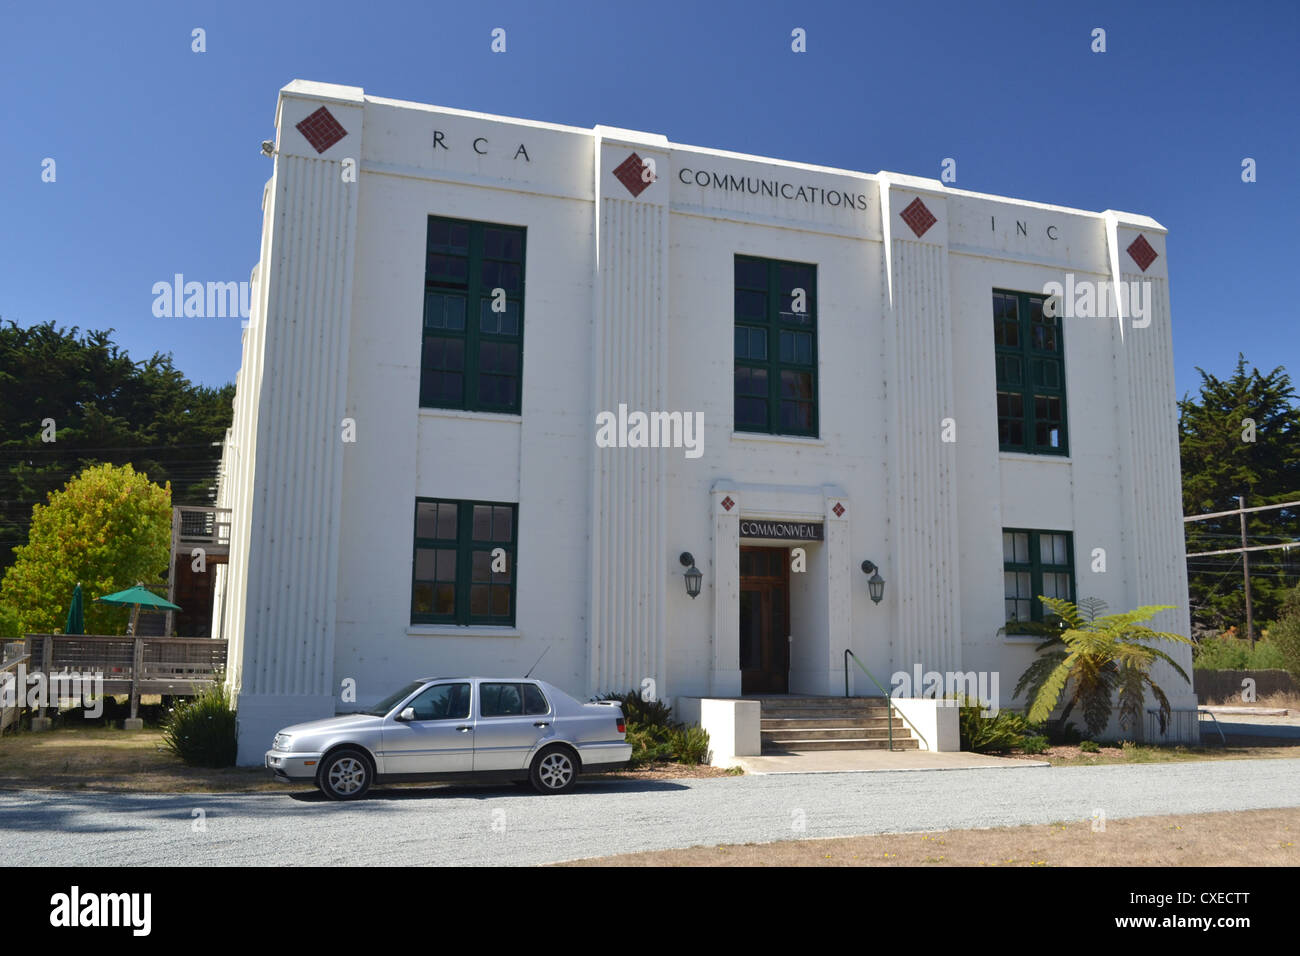 RCA KPH Radio Building at Point Reyes, California - Stock Image